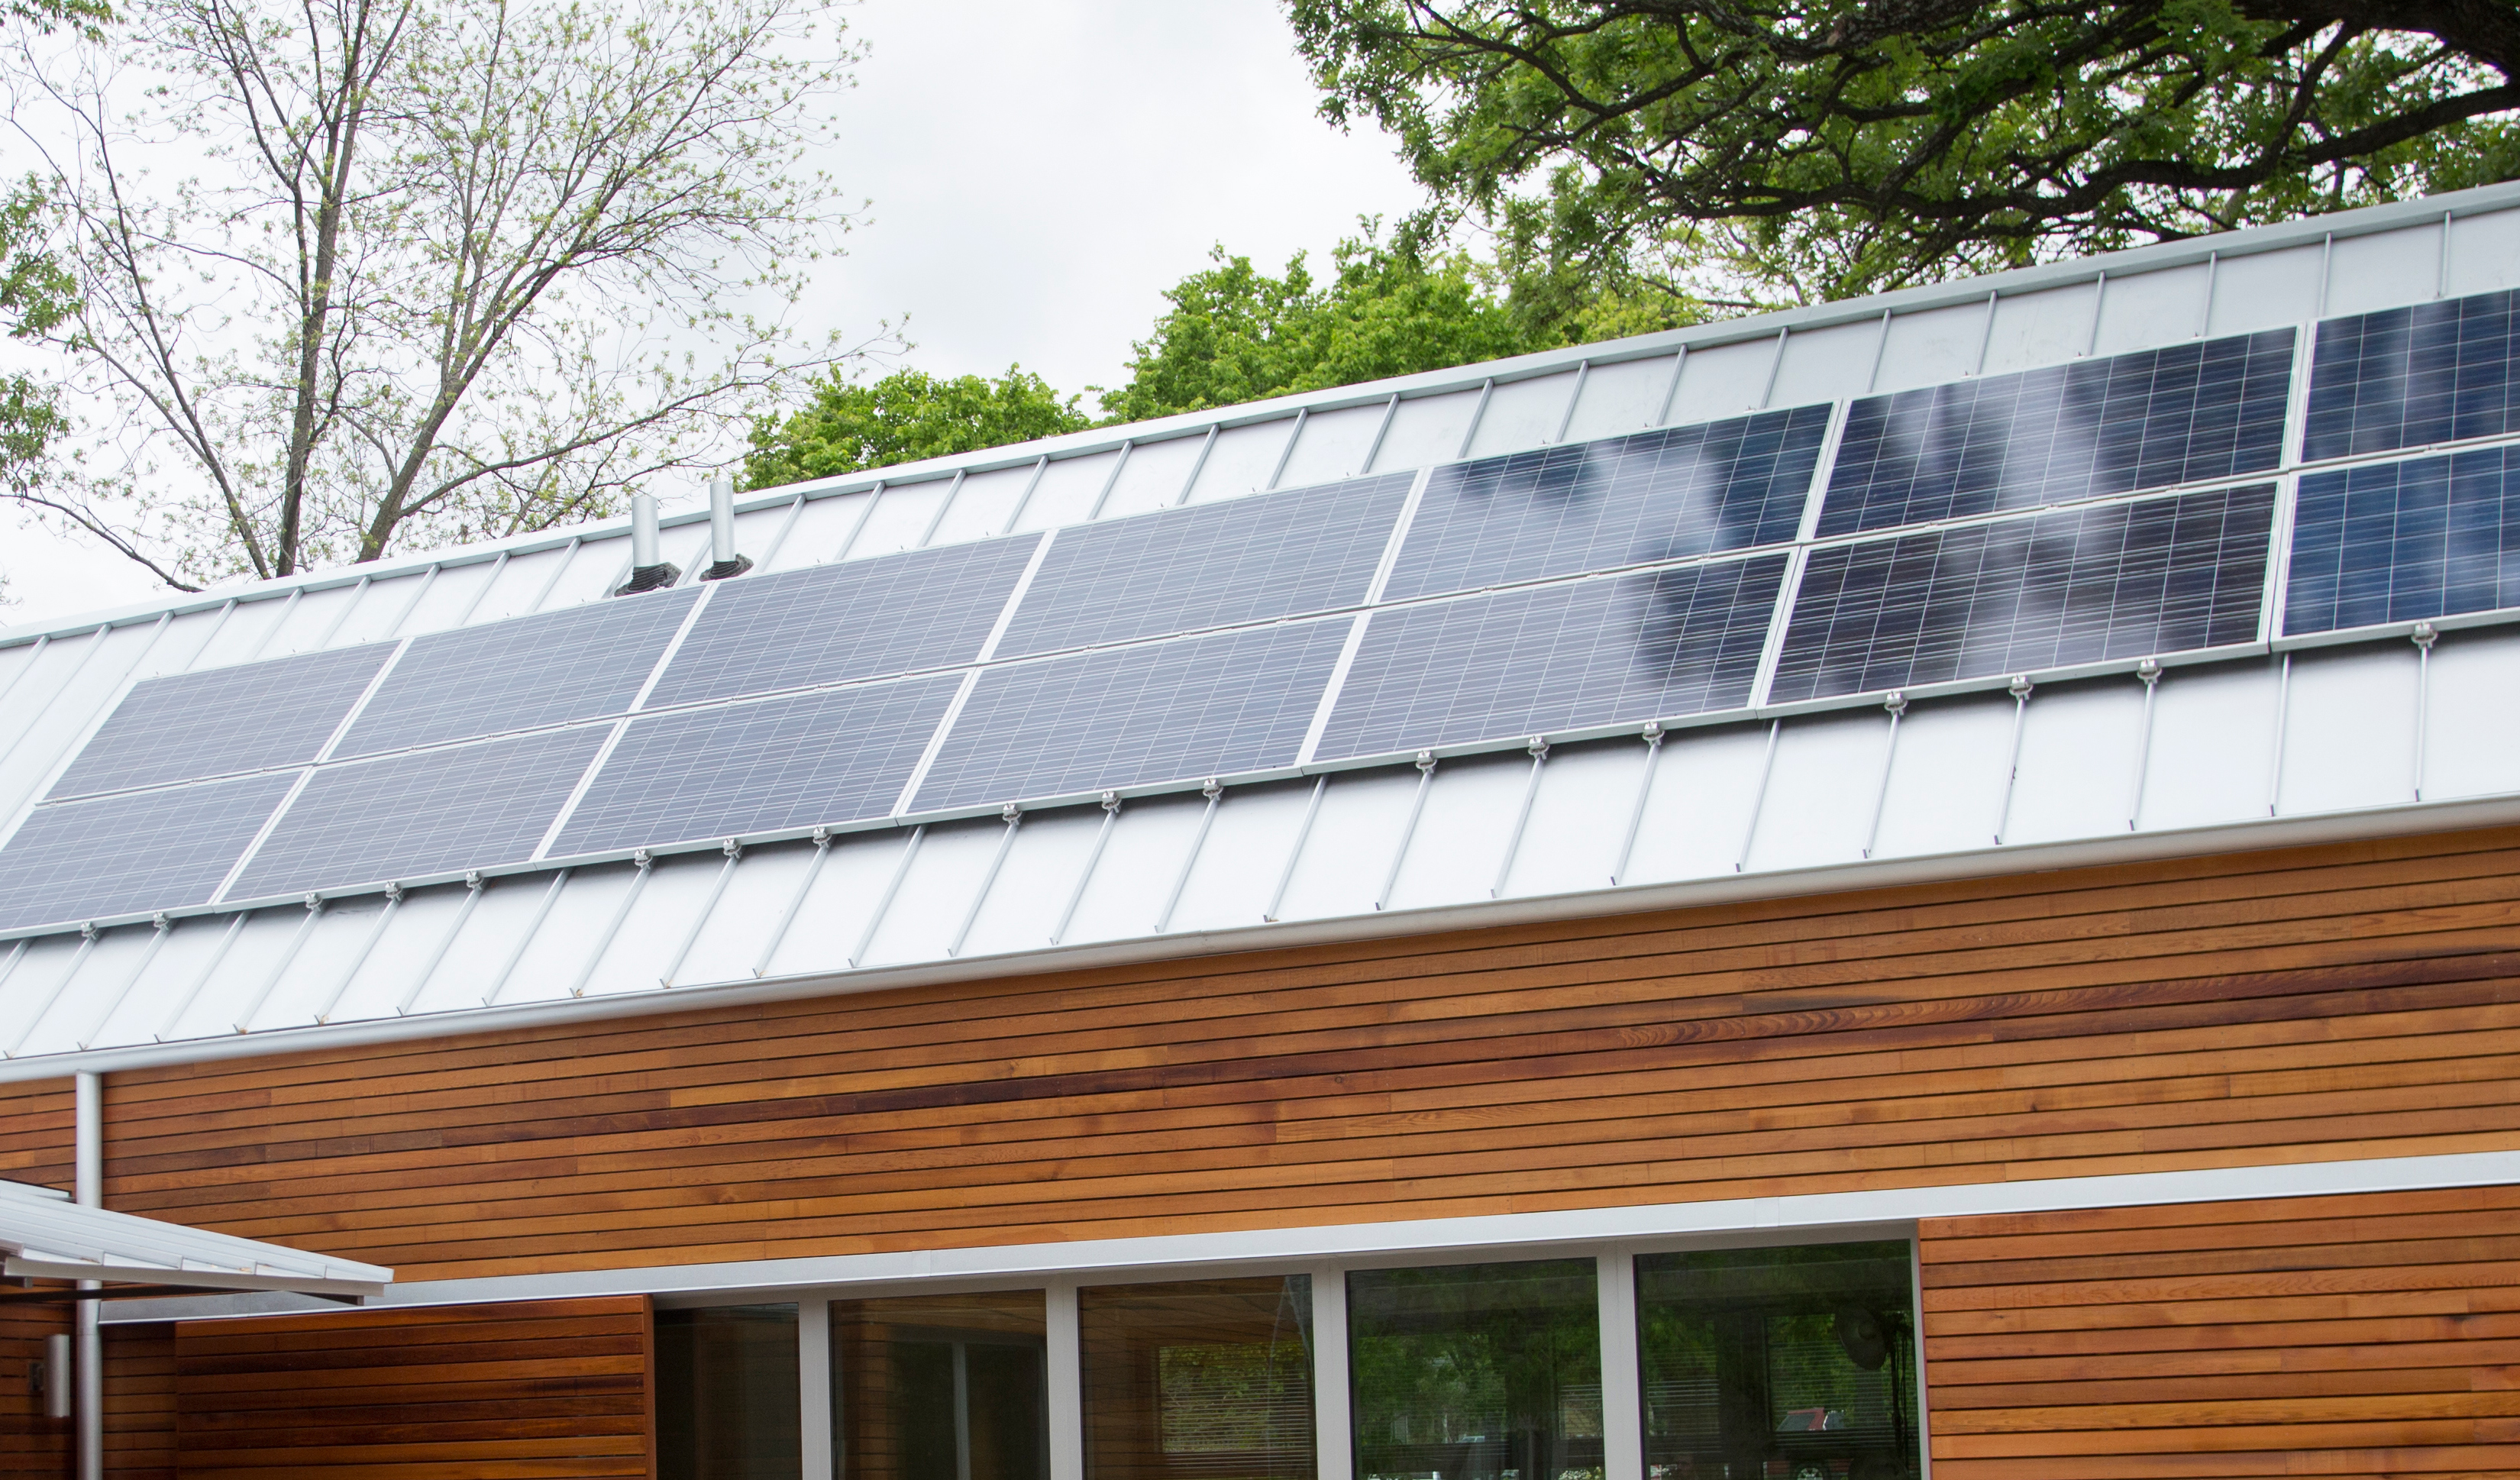 Kansans Who Install Solar Panels May Soon Pay Higher